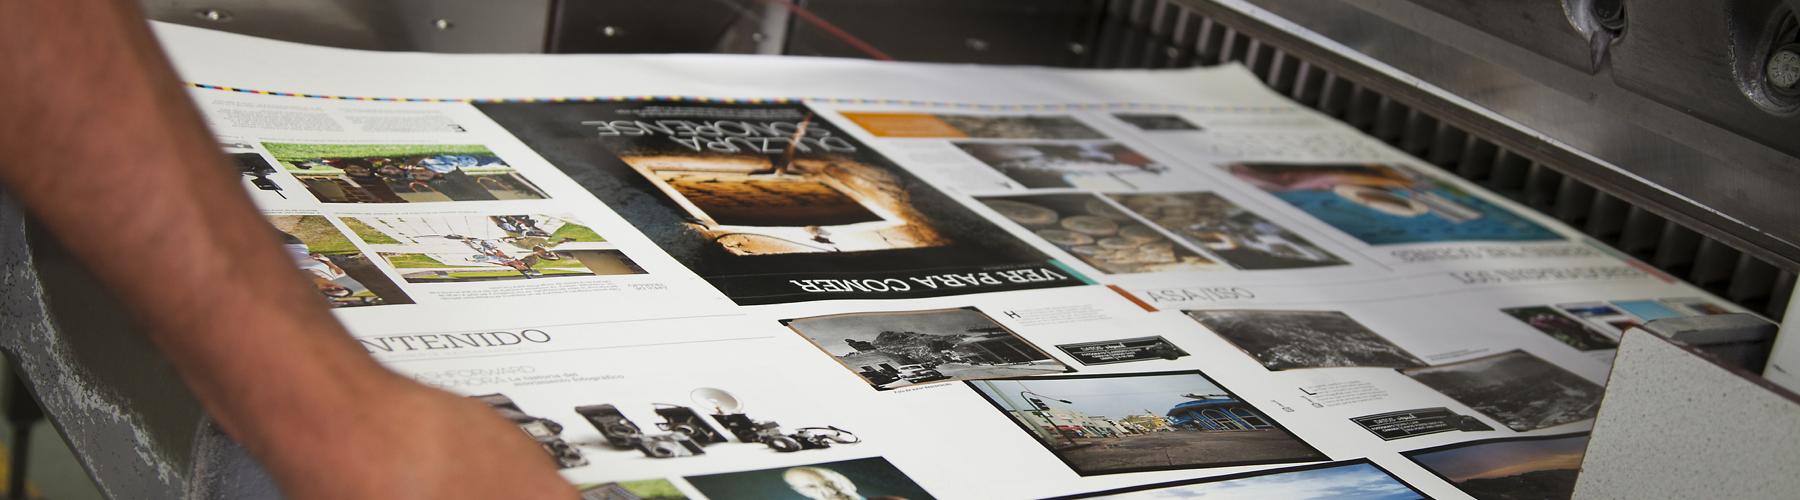 Differenze tra stampa digitale e offset